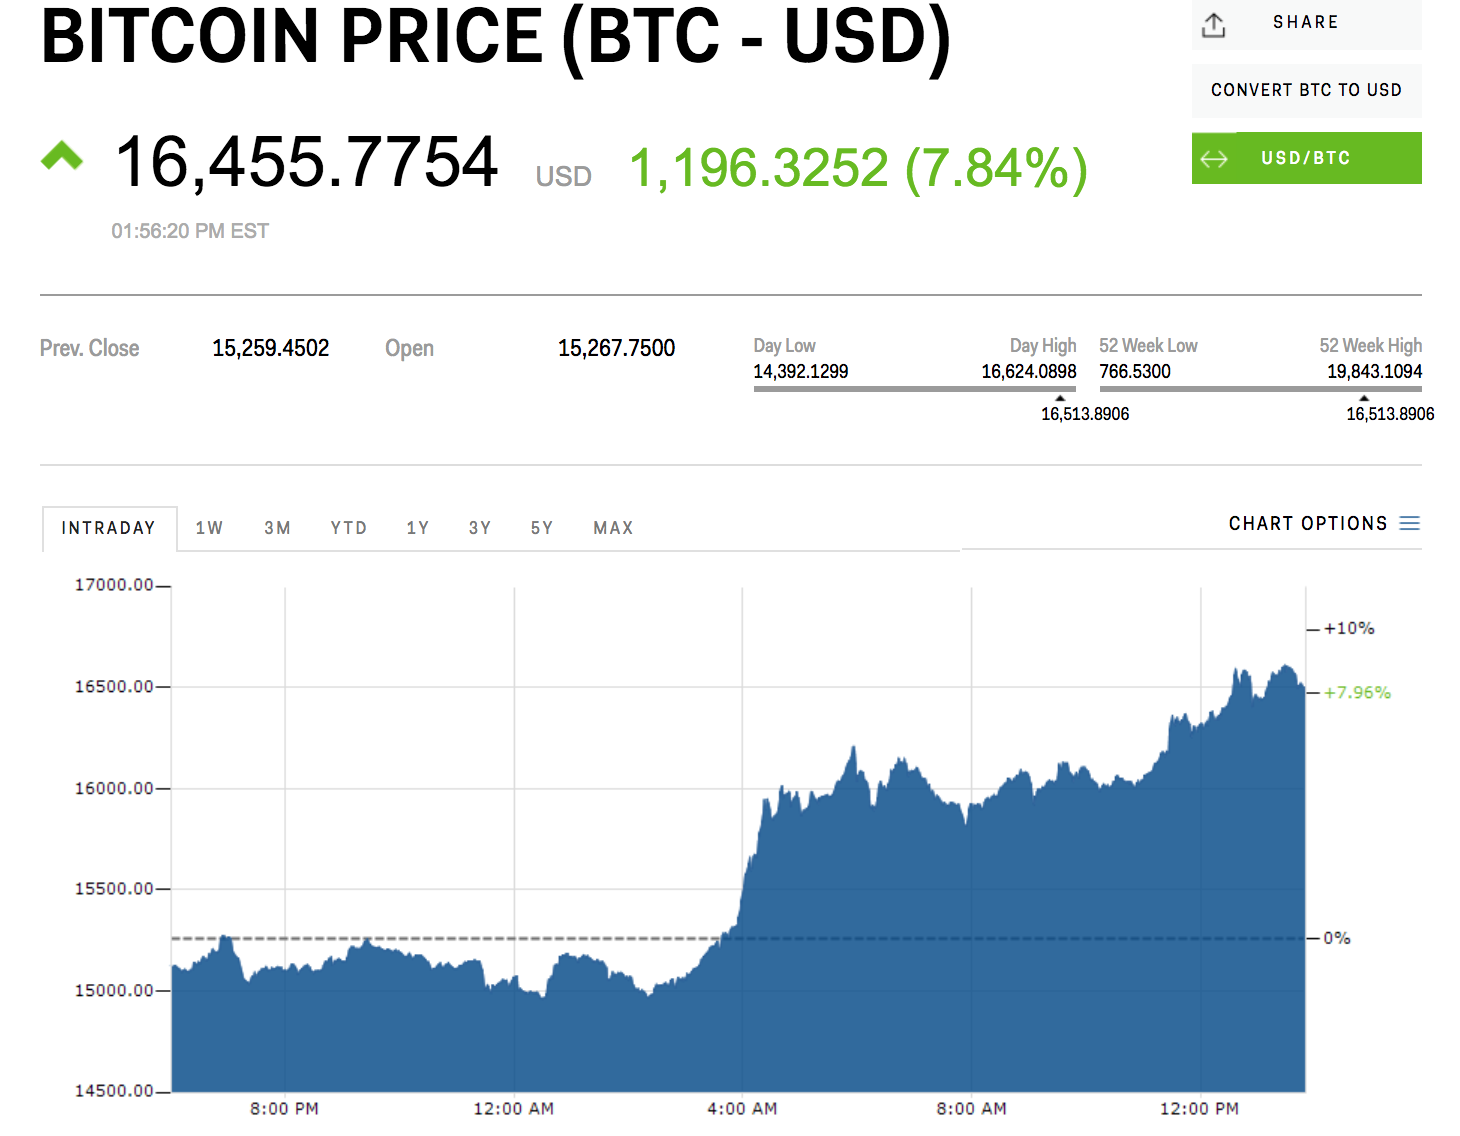 Muc loi tuc bat ngo tu Bitcoin anh 1